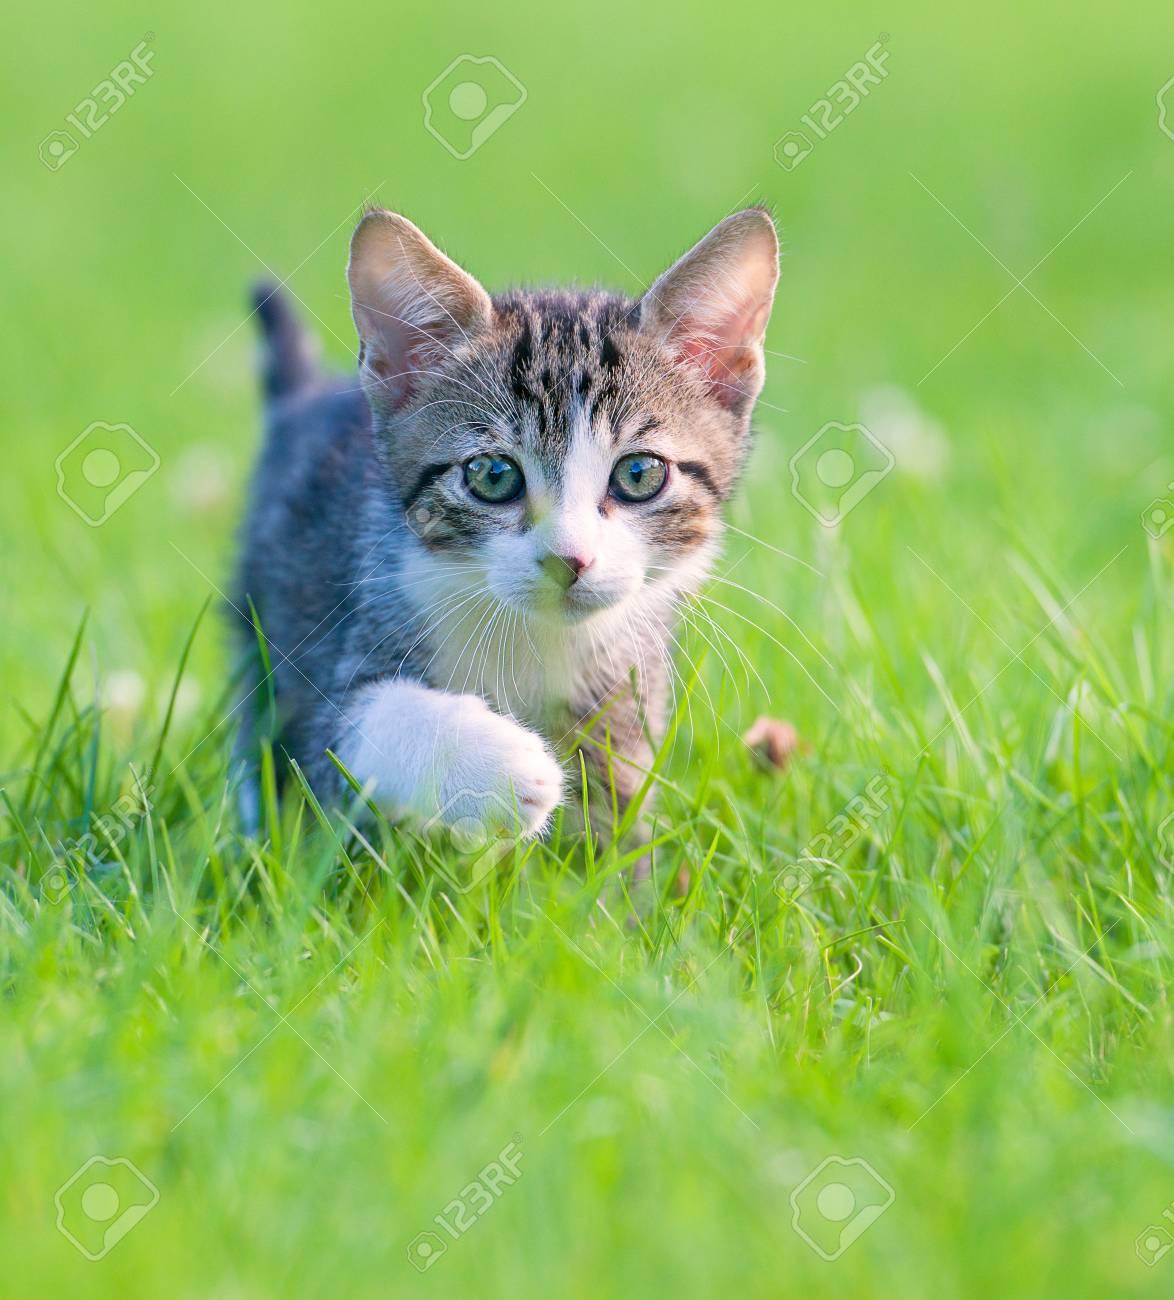 Little striped kitten hiding in the grass - 94117809